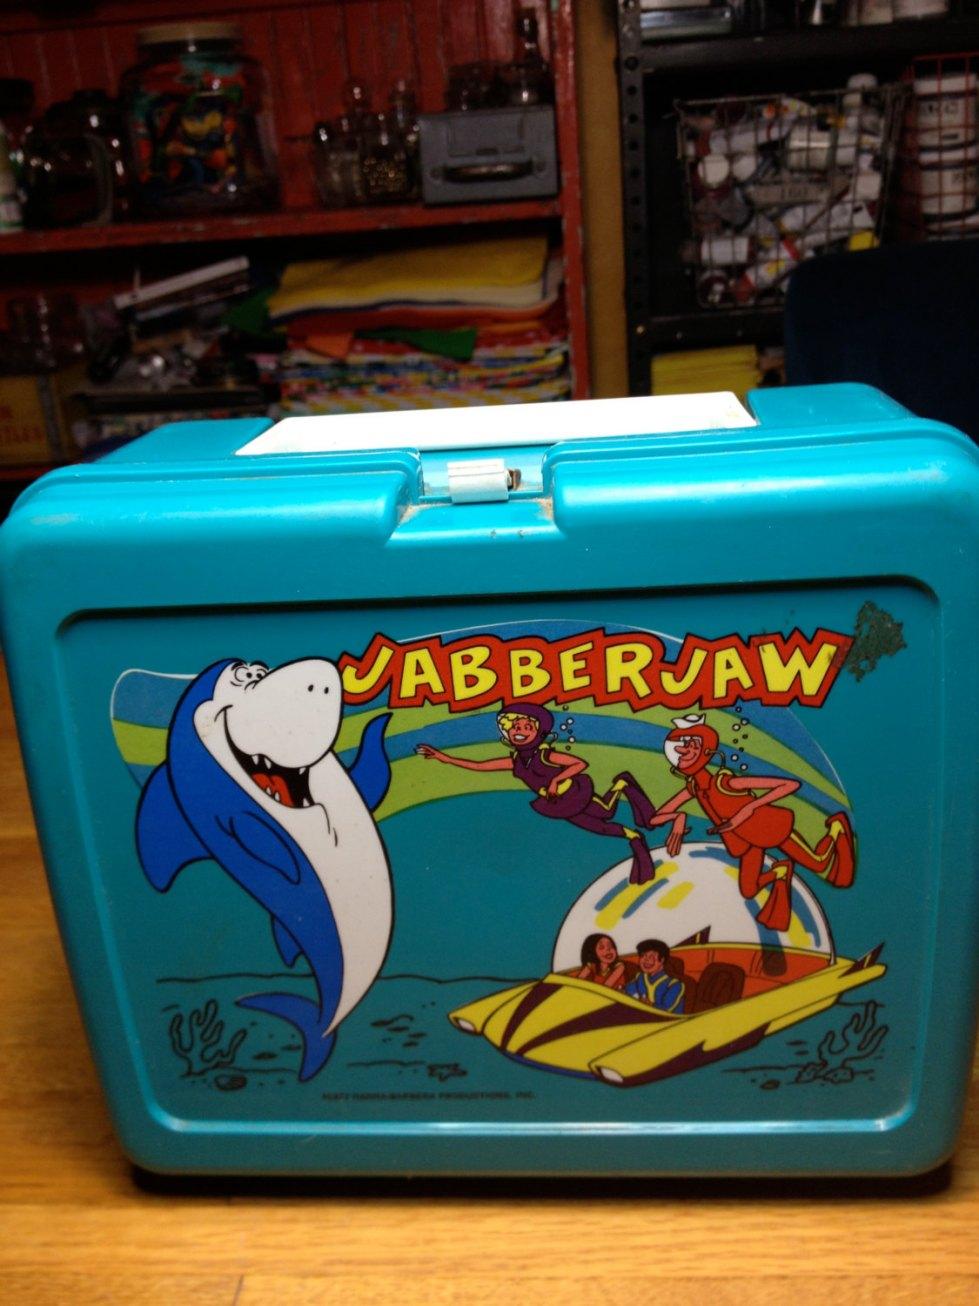 Jabberjaw lunchbox like the kind I was familiar with